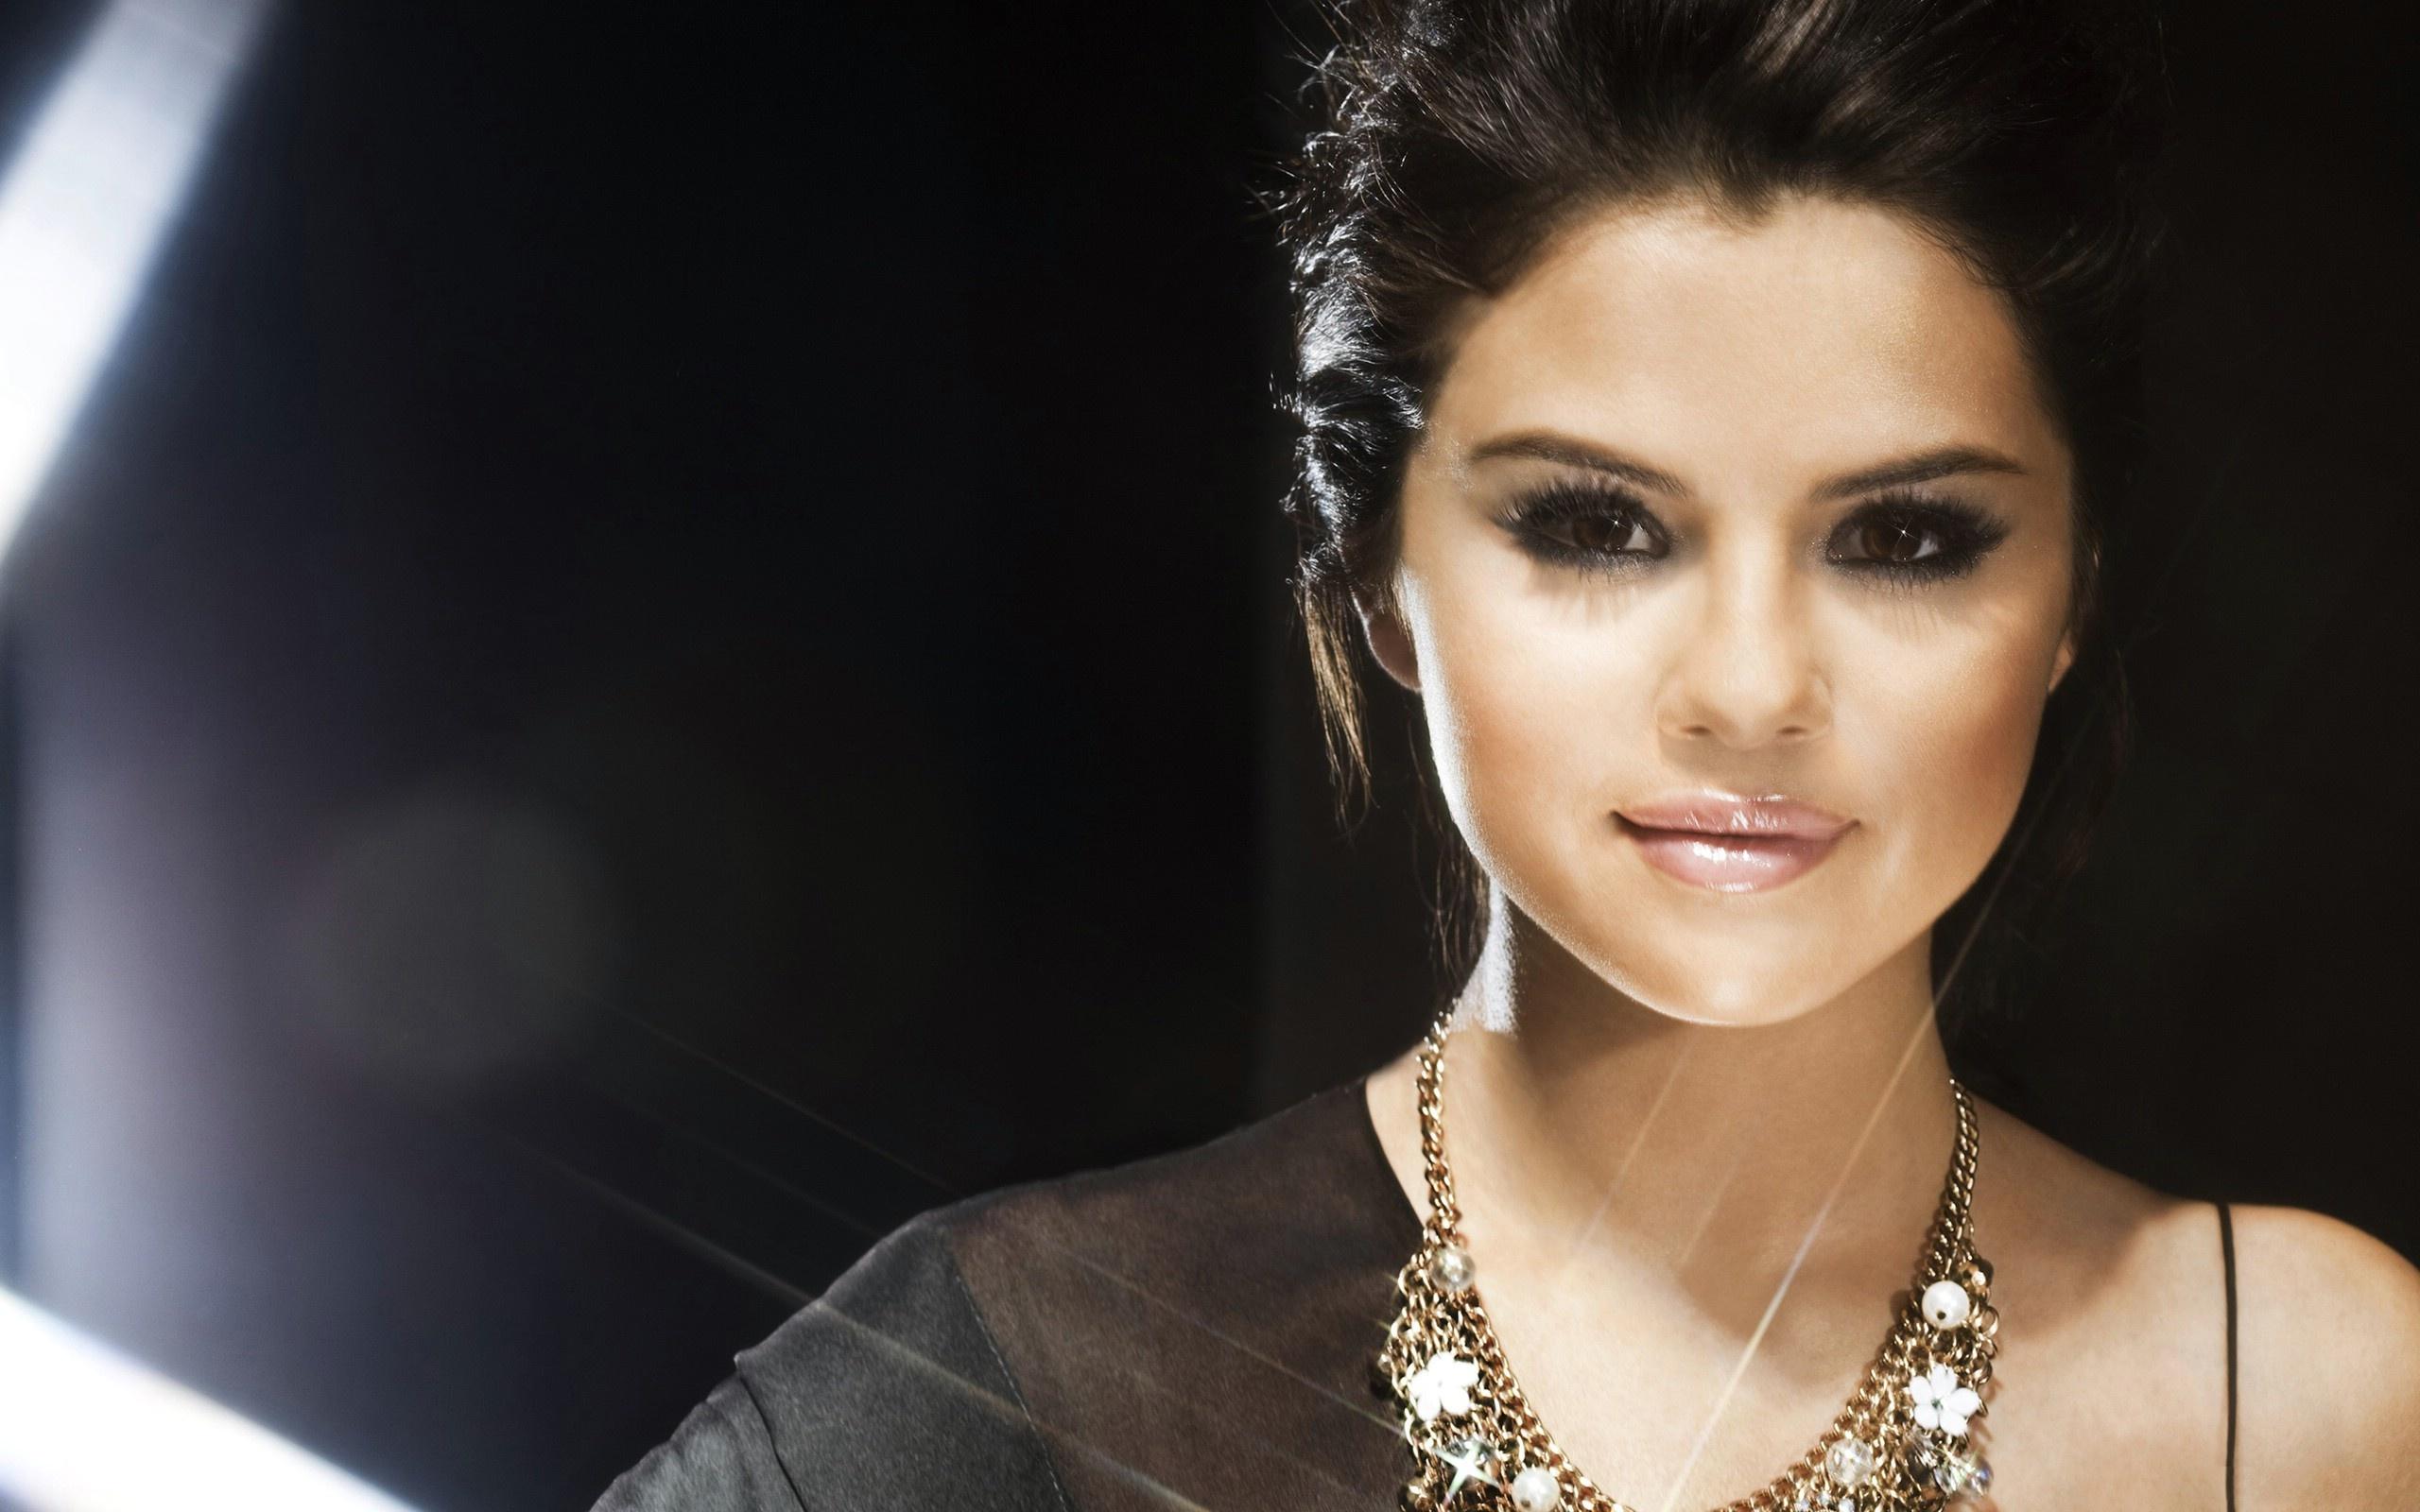 wallpapers Selena Gomez [HD]   Taringa 2560x1600